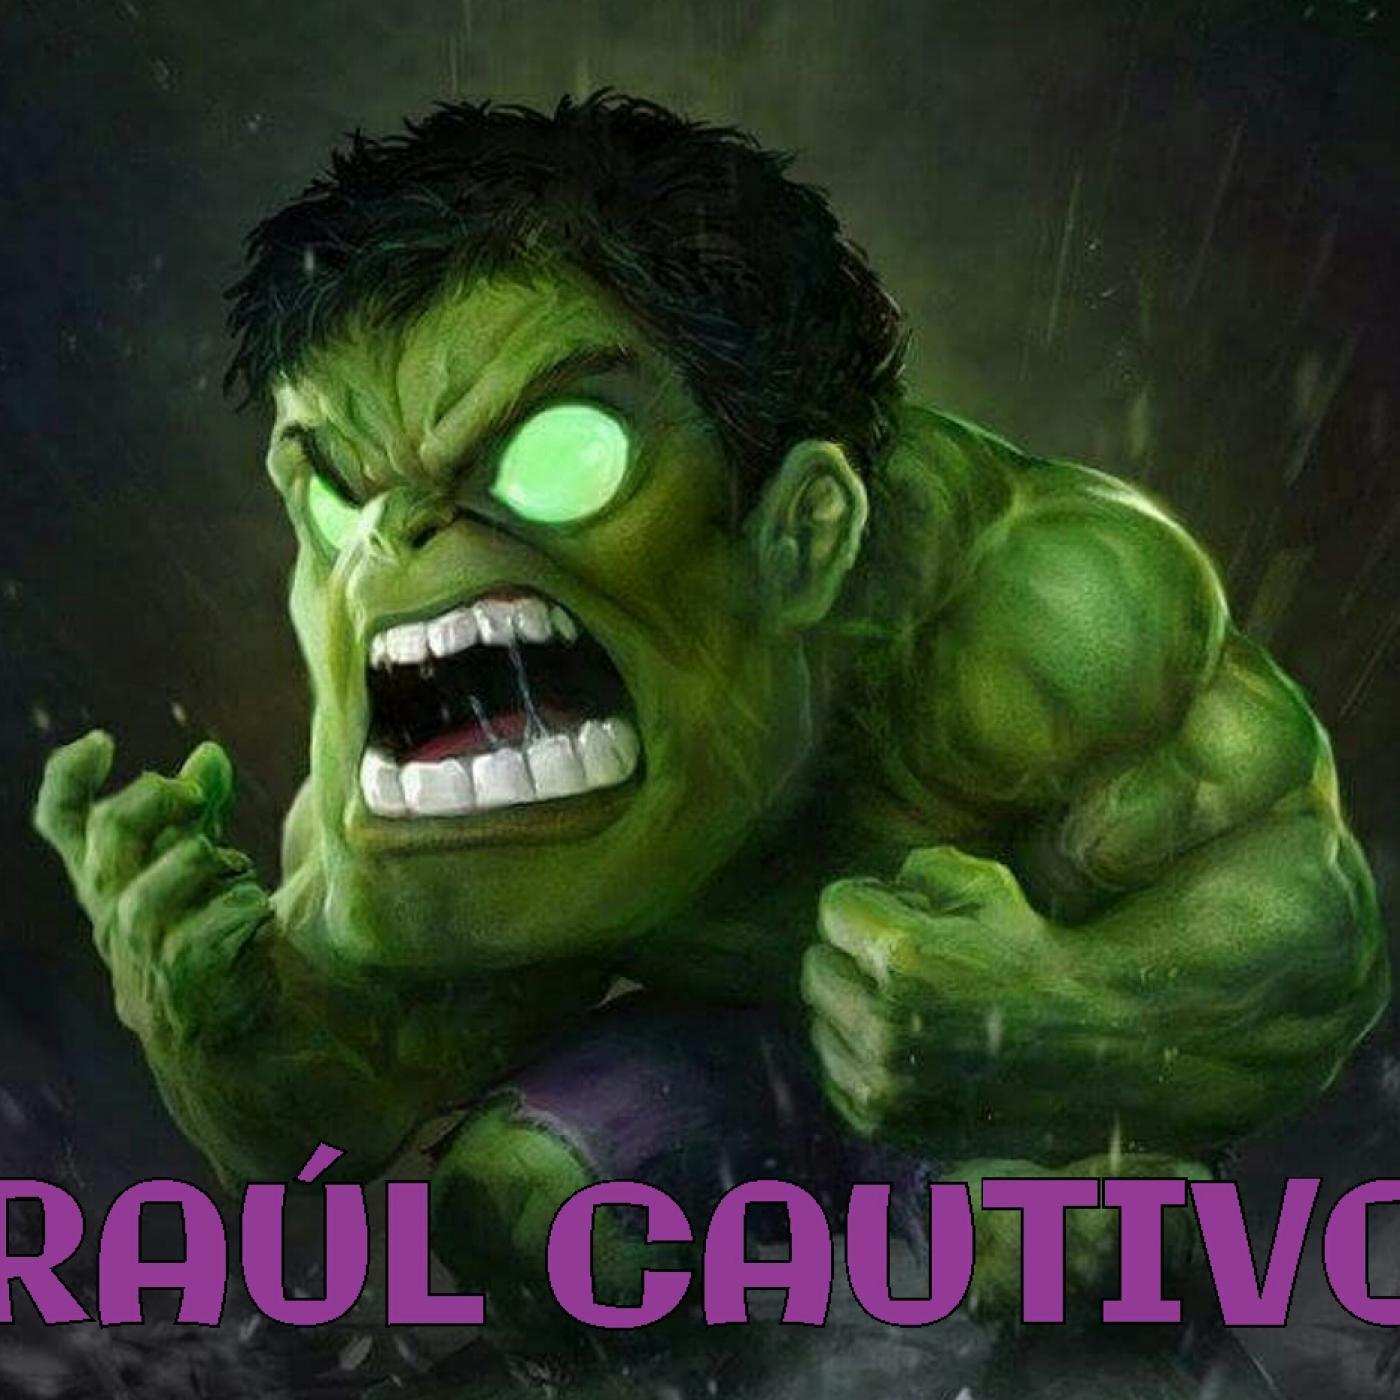 RAUL CAUTIVO